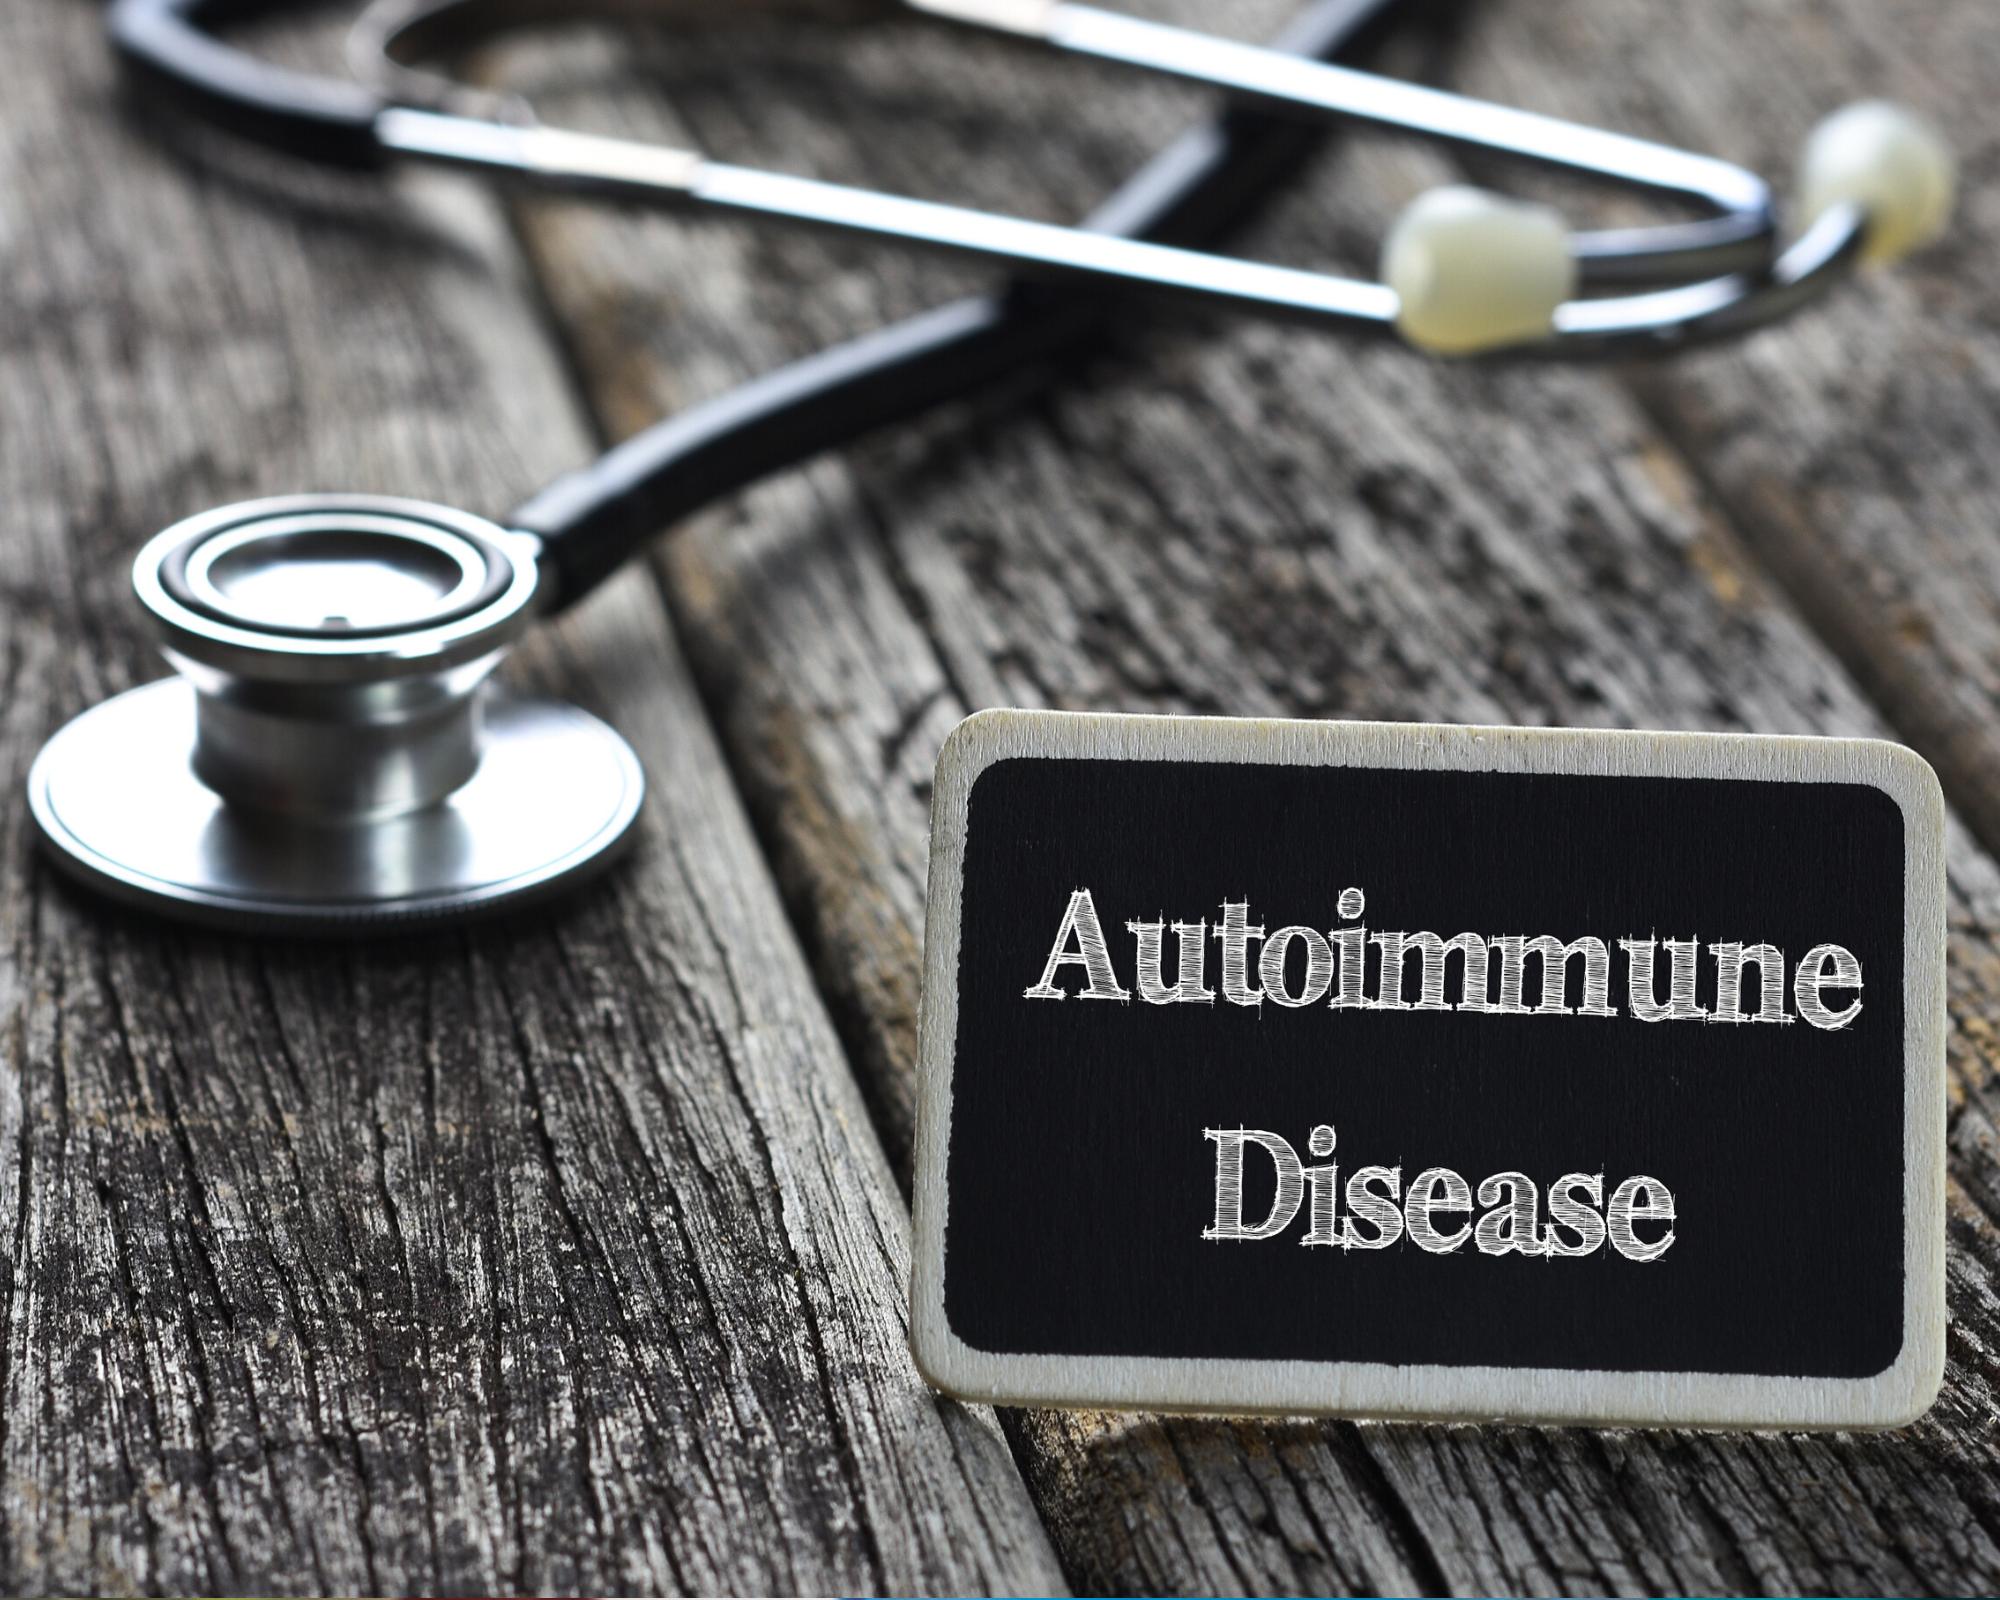 Medical Imagery of stethoscope next to sign saying autoimmune disease